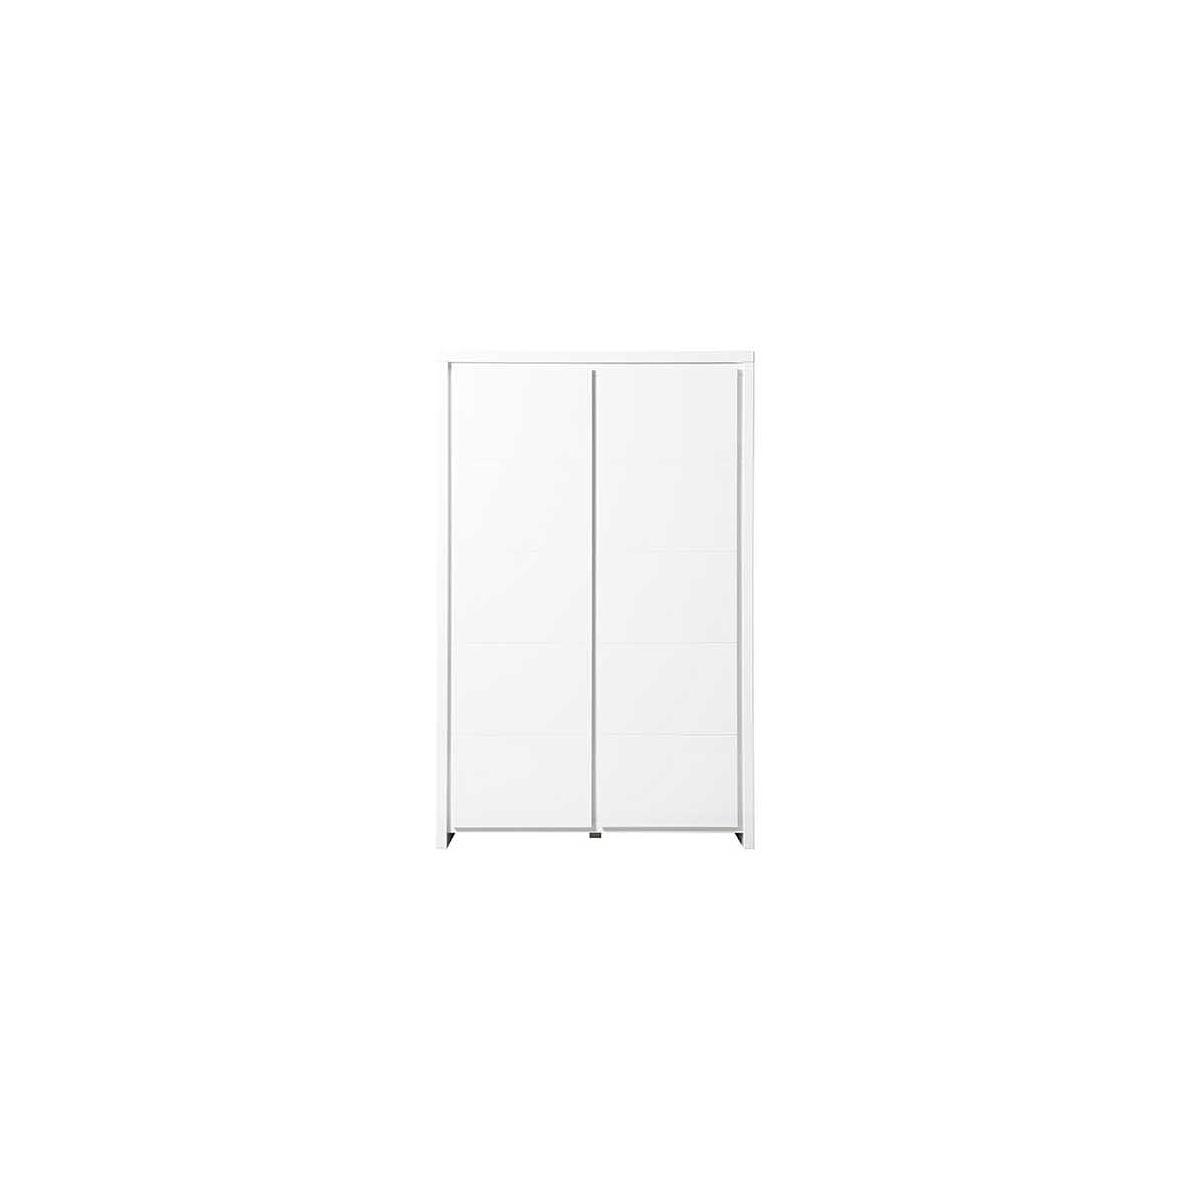 CAMILLE by Bopita Armoire 2 portes XL